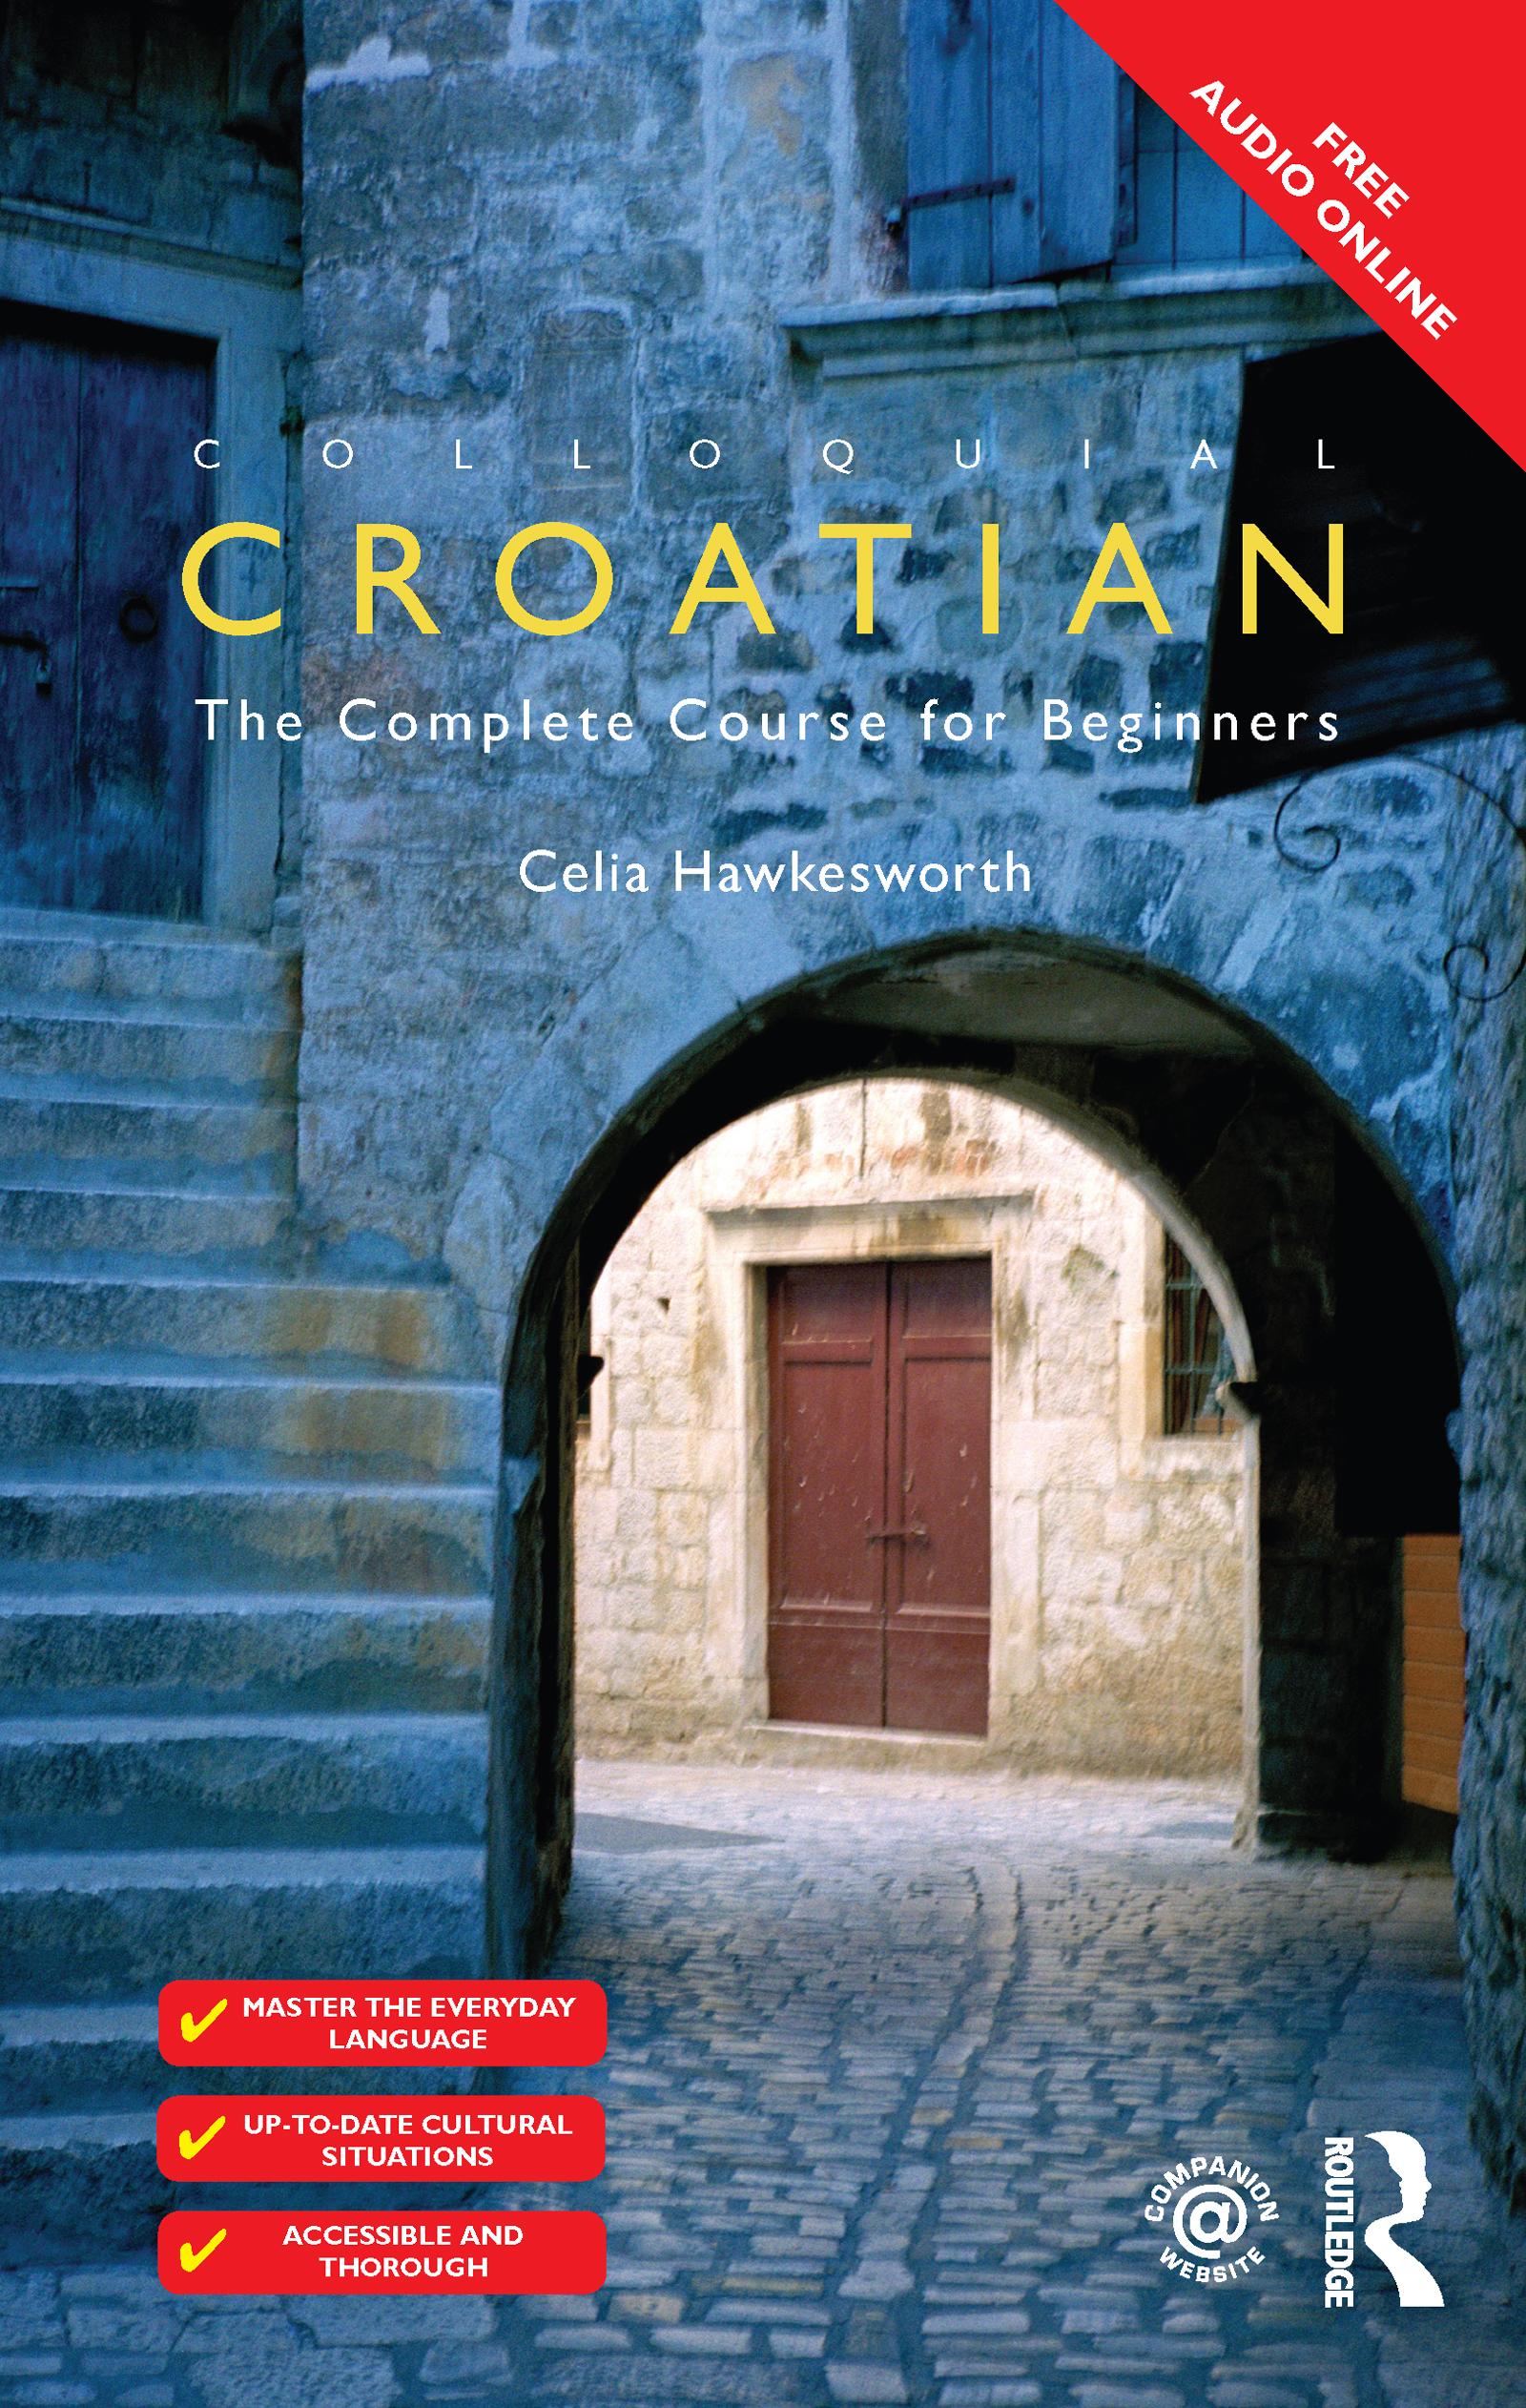 Colloquial Croatian book cover